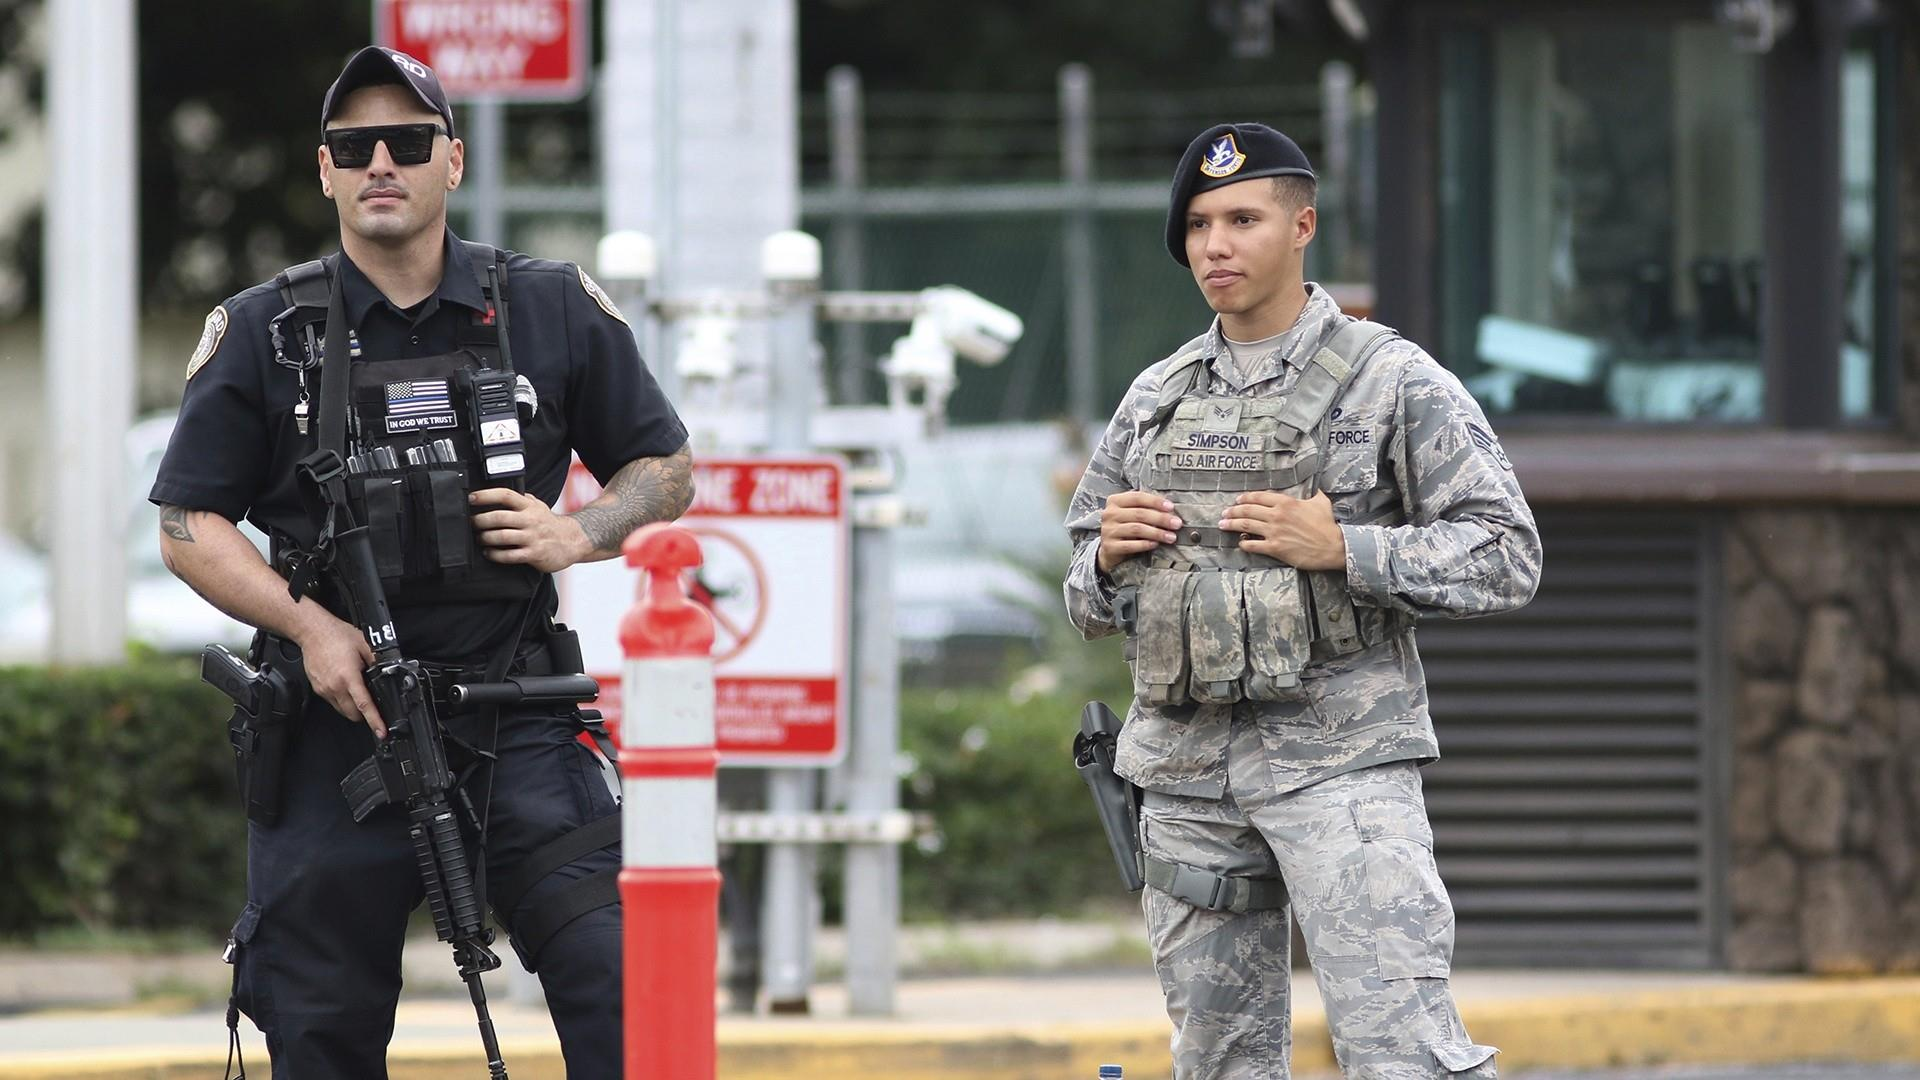 Sailor at Pearl Harbor opens fire, kills 2 before killing himself